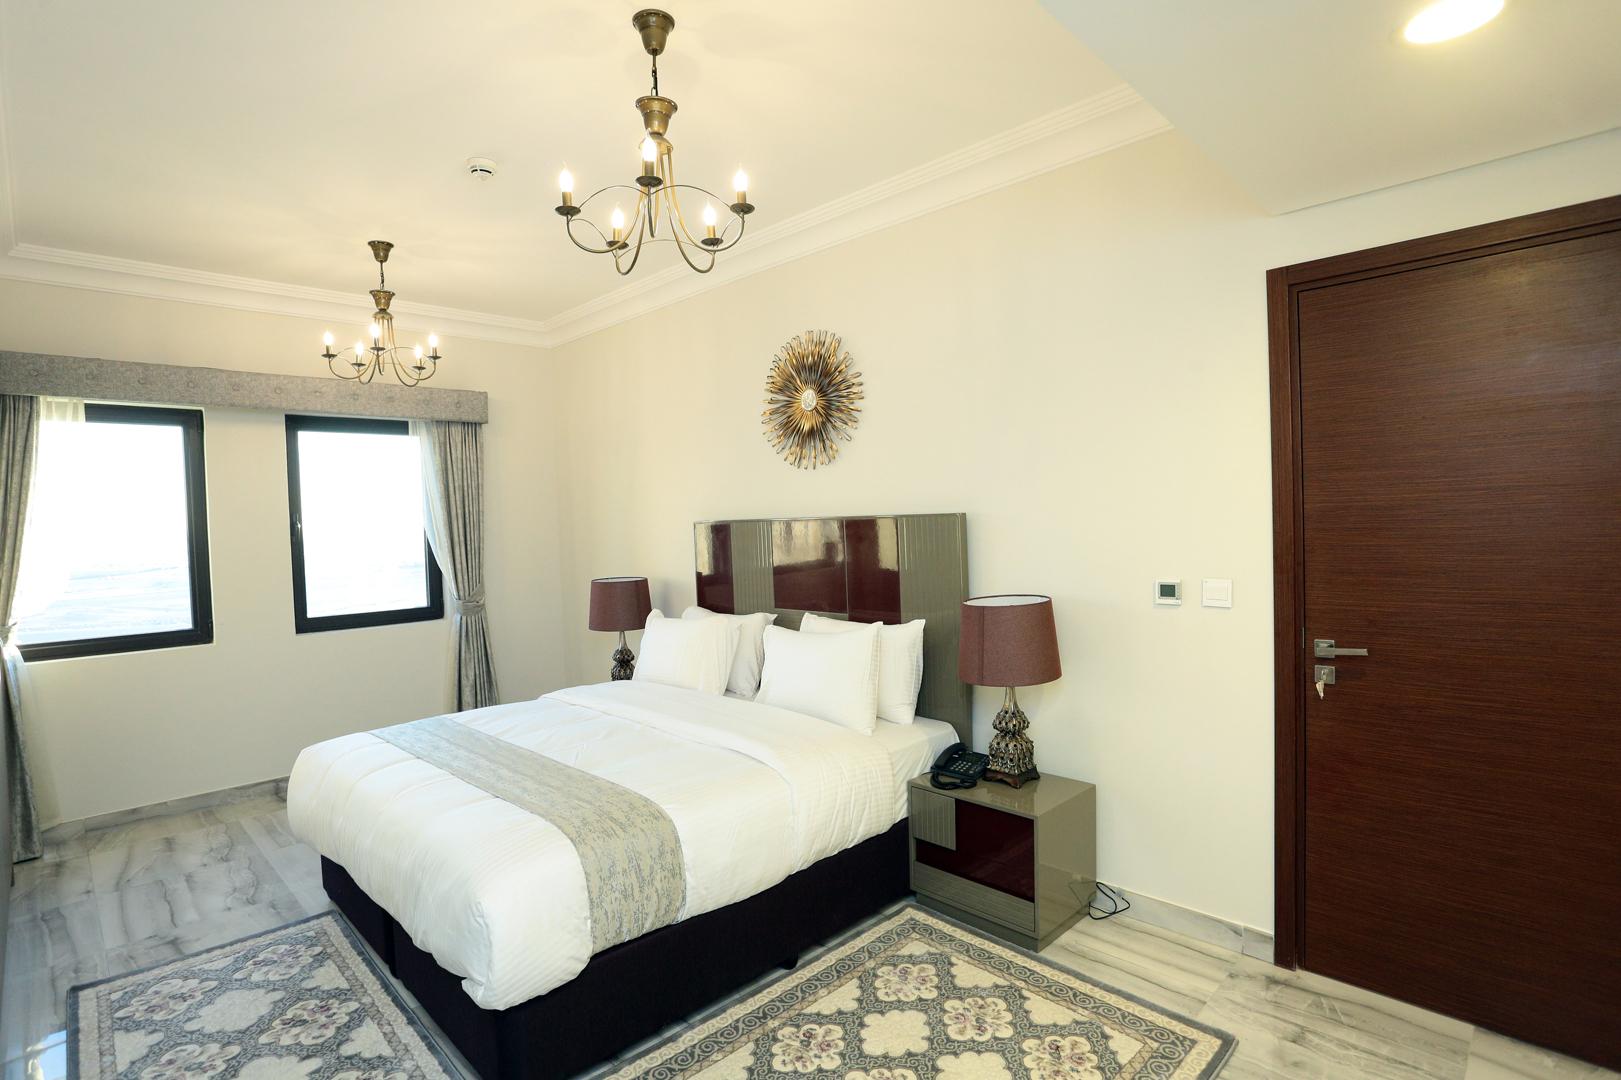 Marbella Luxury 2 bedrooms photo 27263077